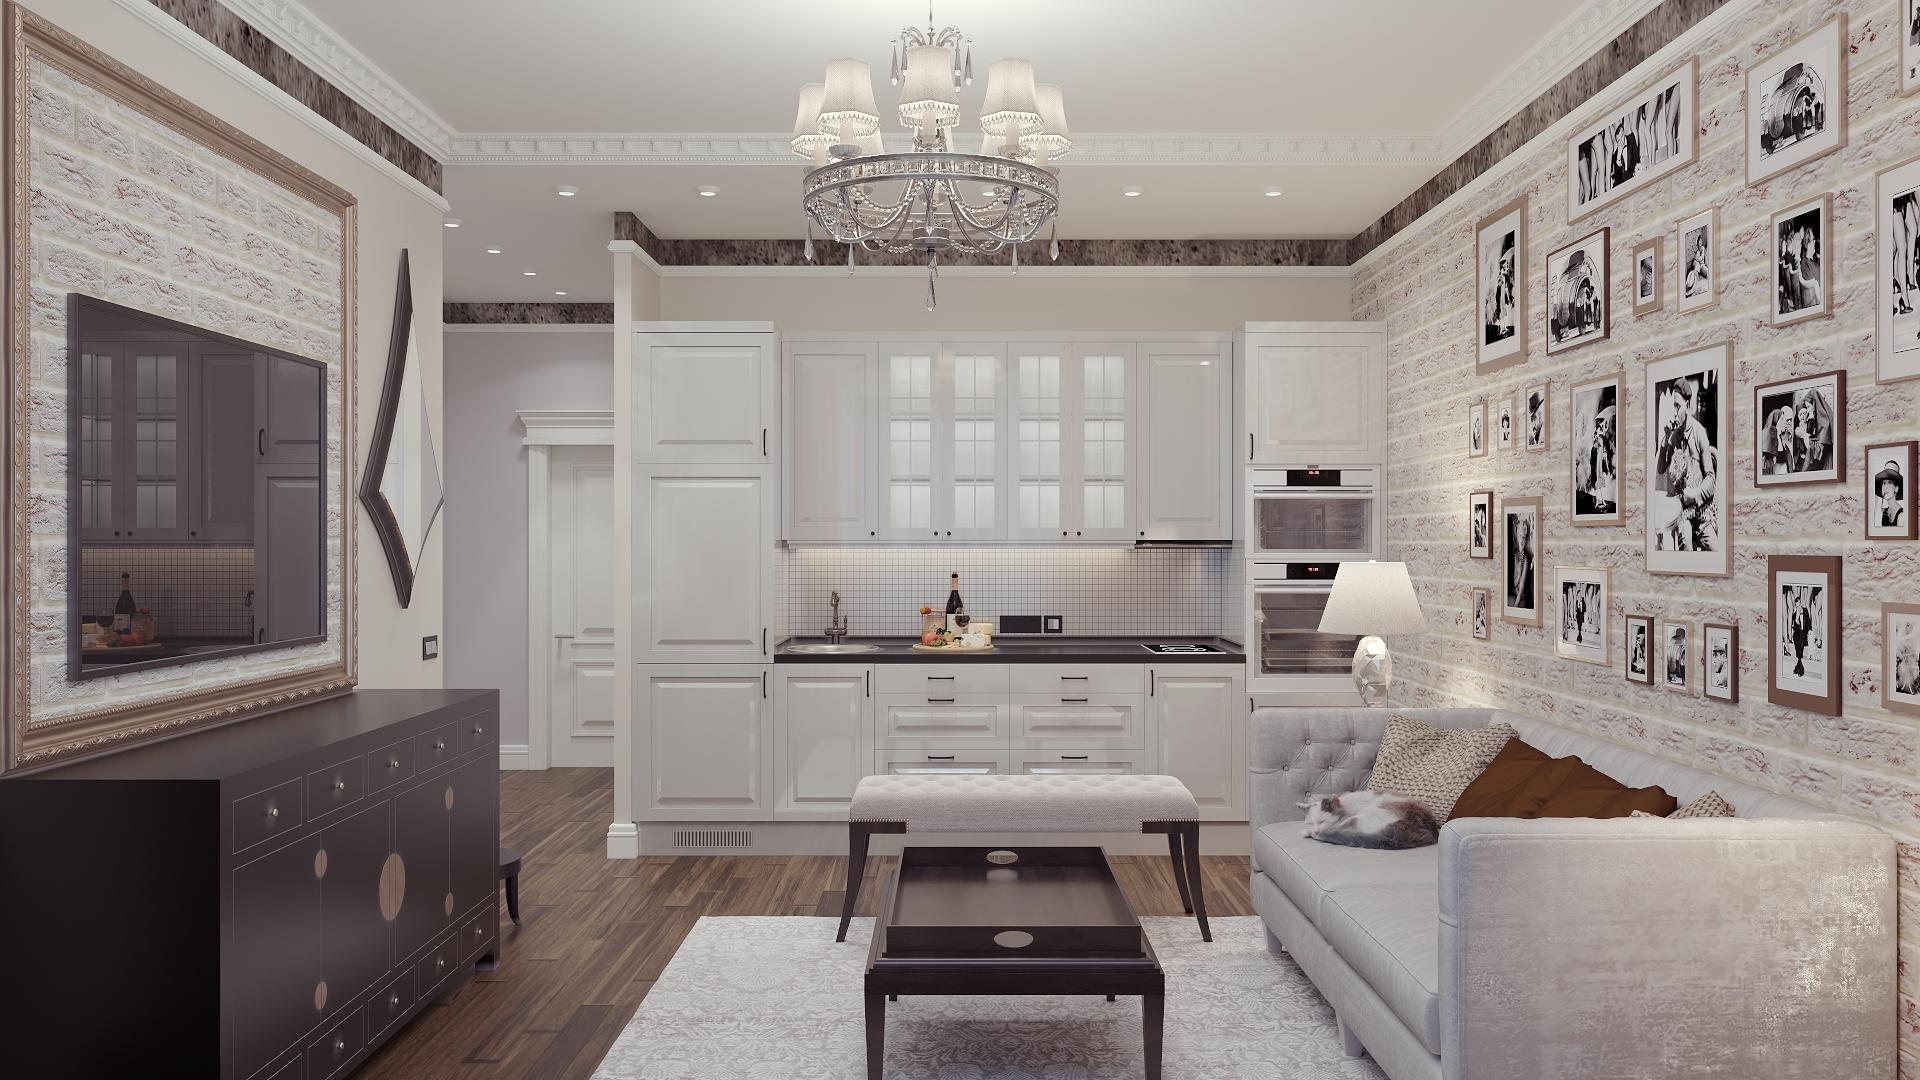 Kitchen.. in 3d max corona render image